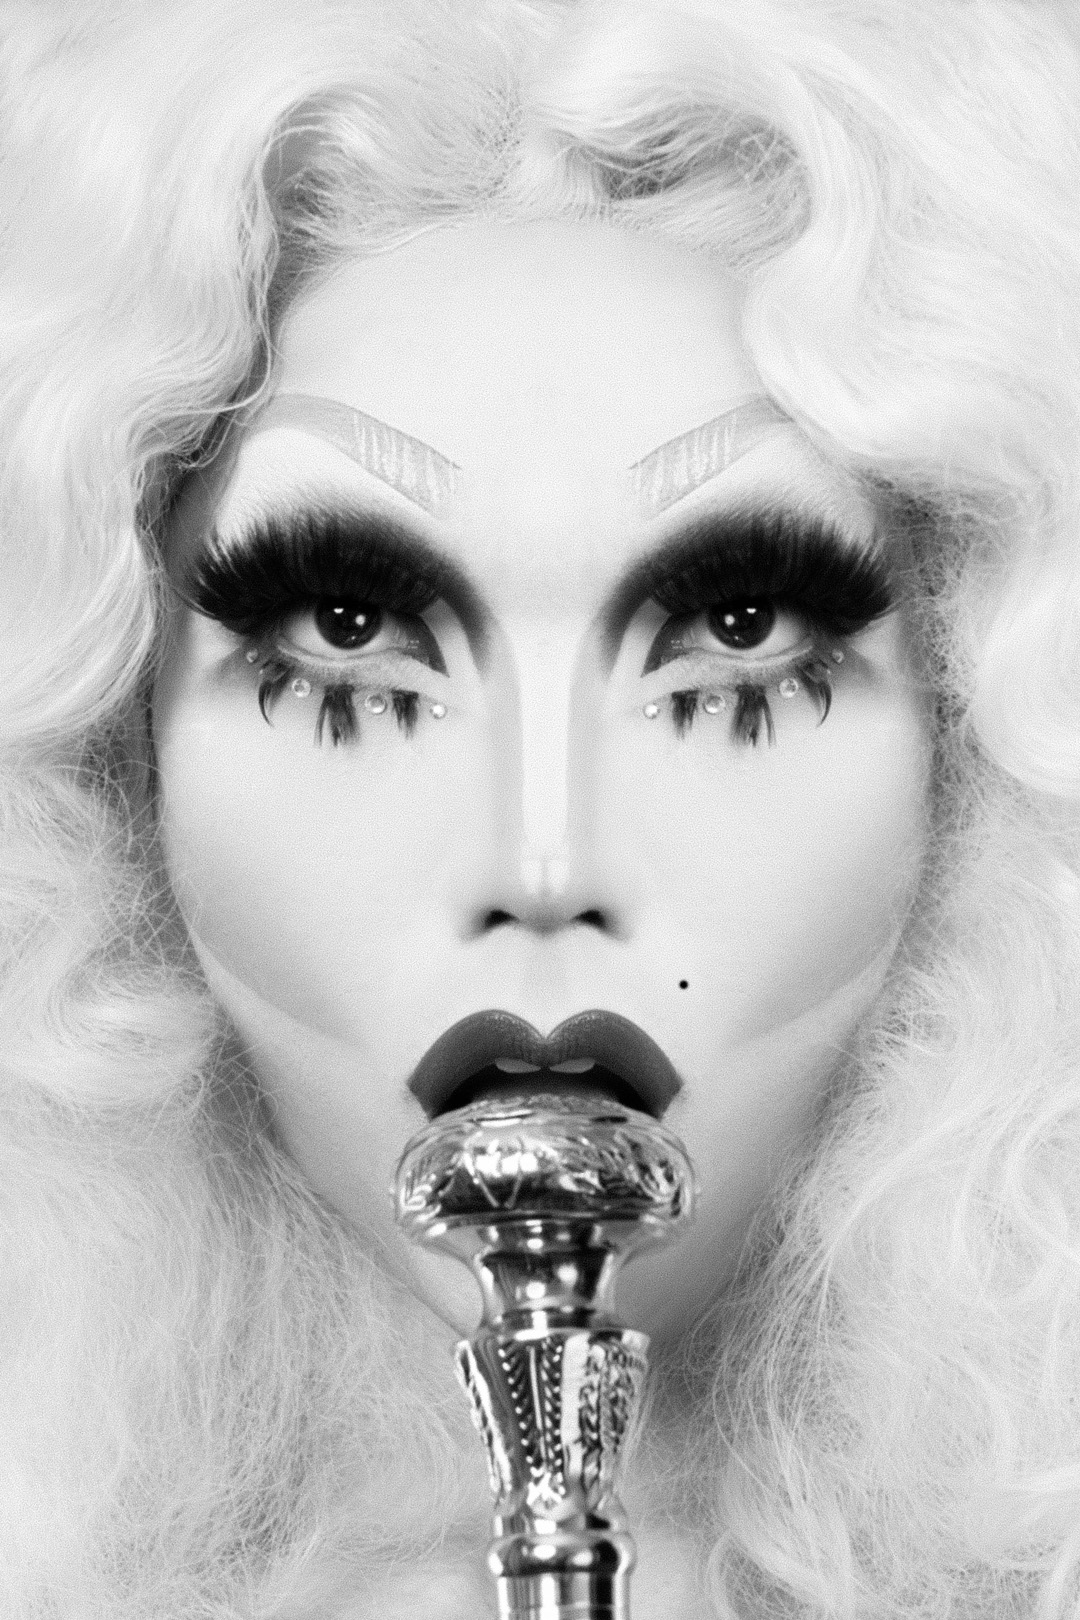 Black-and-white portrait of Betty Fvck (model, drag icon, event organizer / promoter and burlesque perfomer) shot in Fotografie Berlin e.V. studio (Berlin, Neukölln)